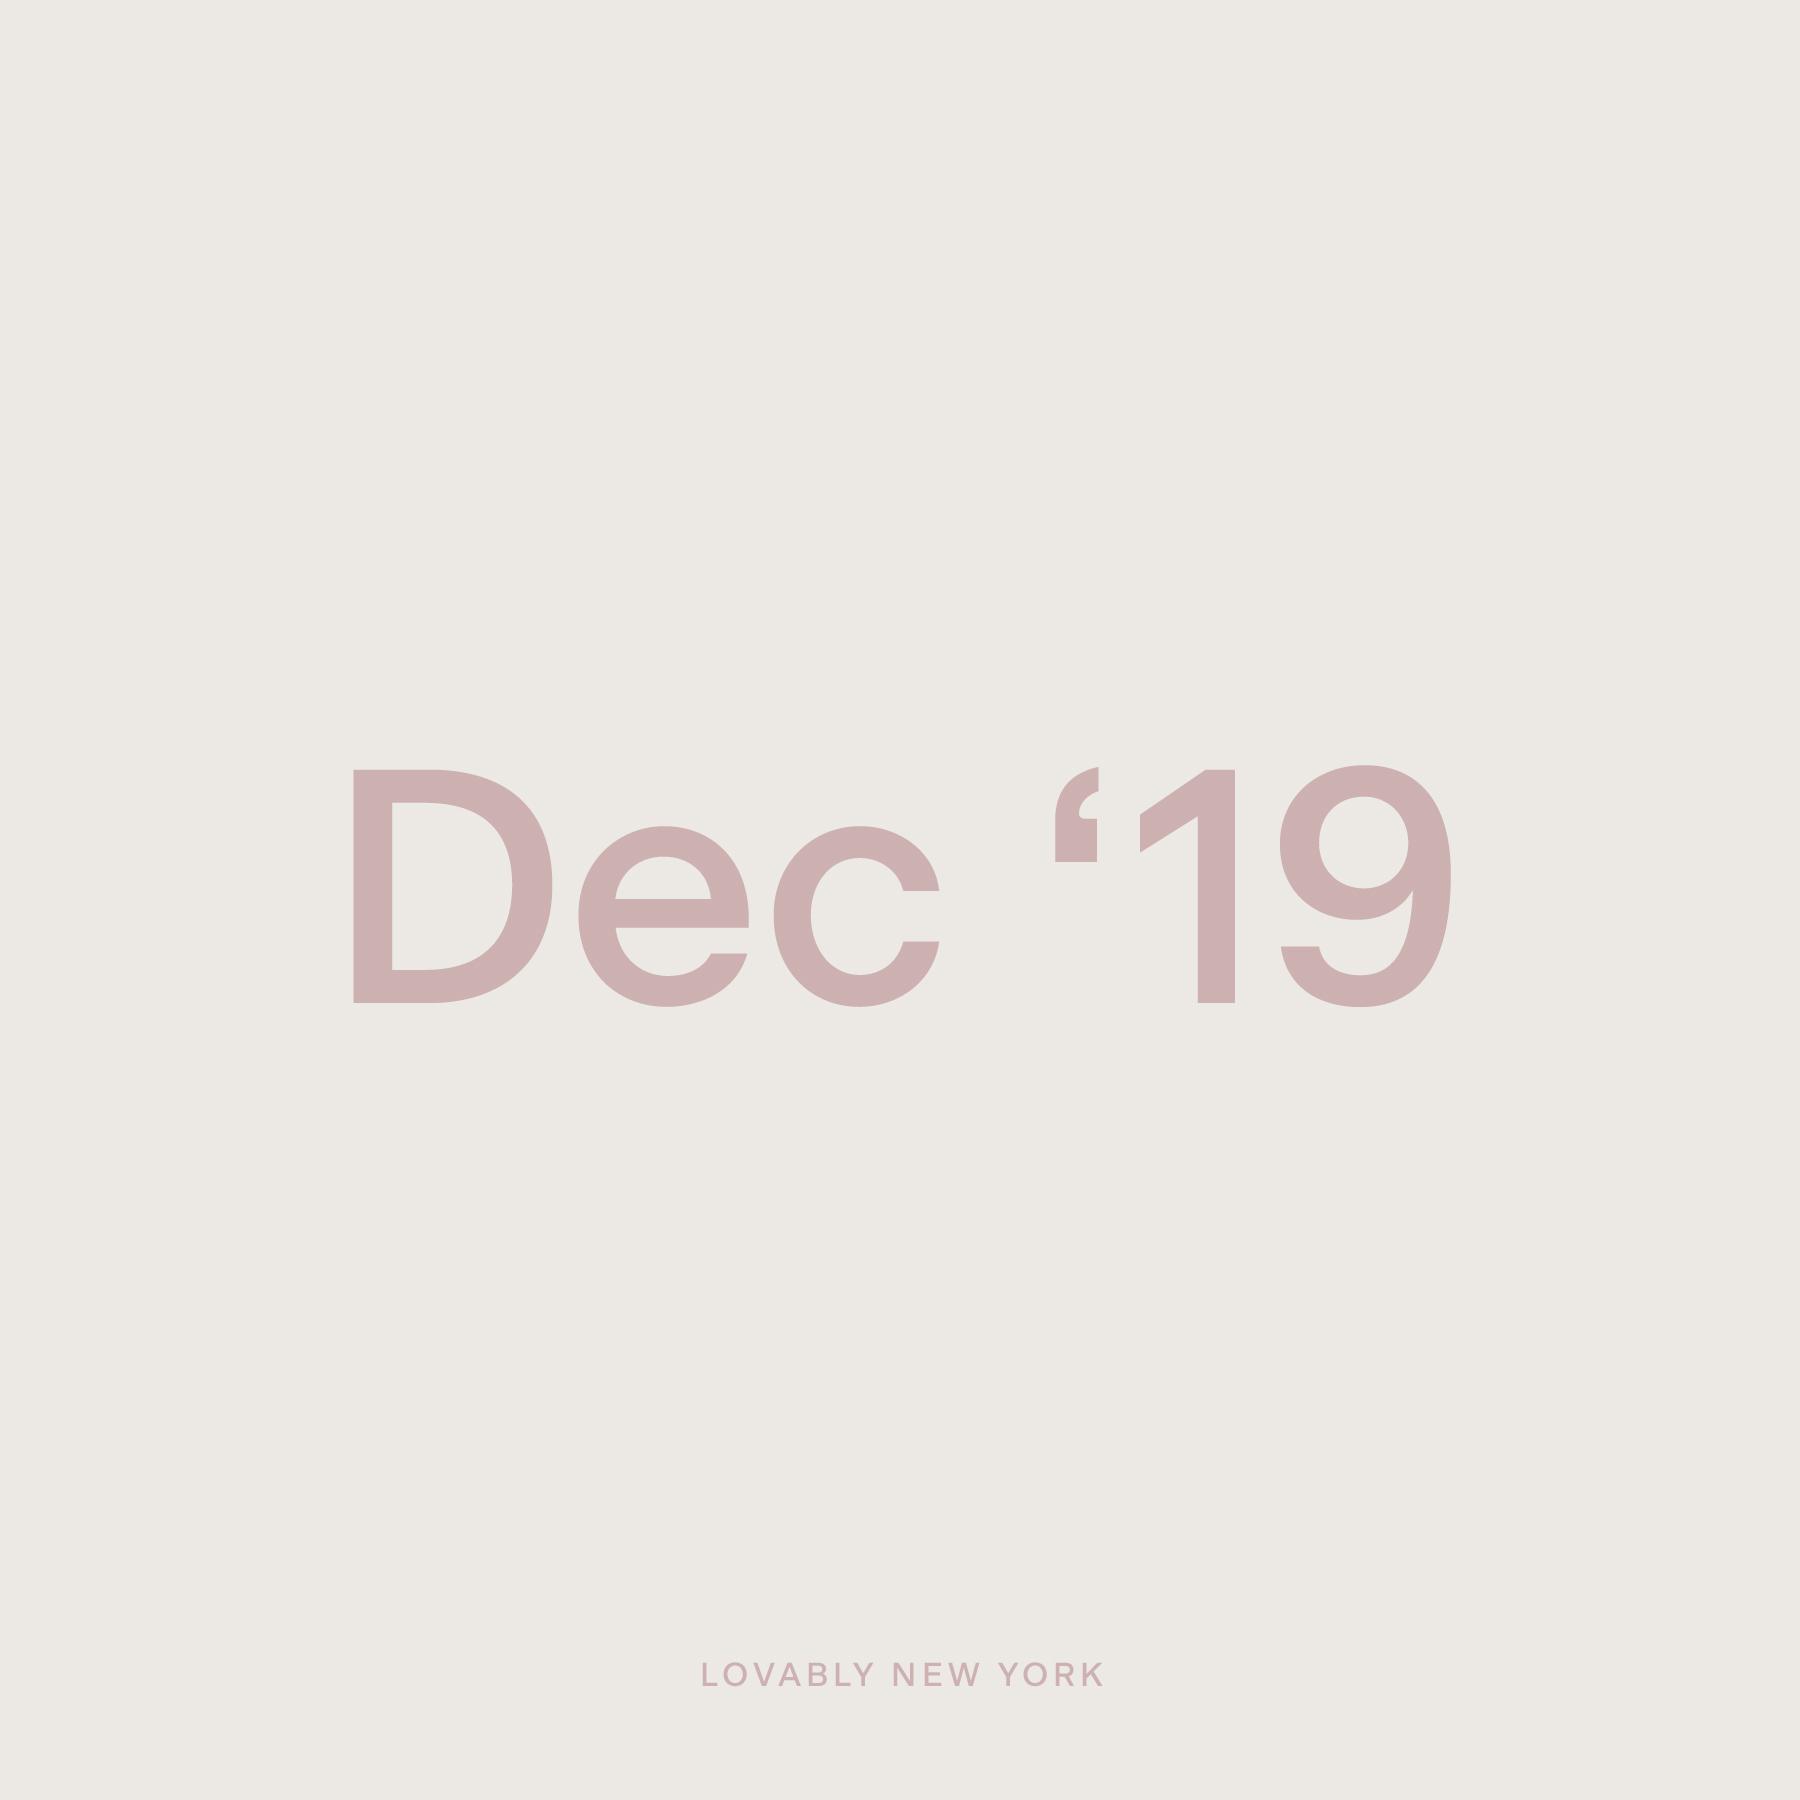 December '19